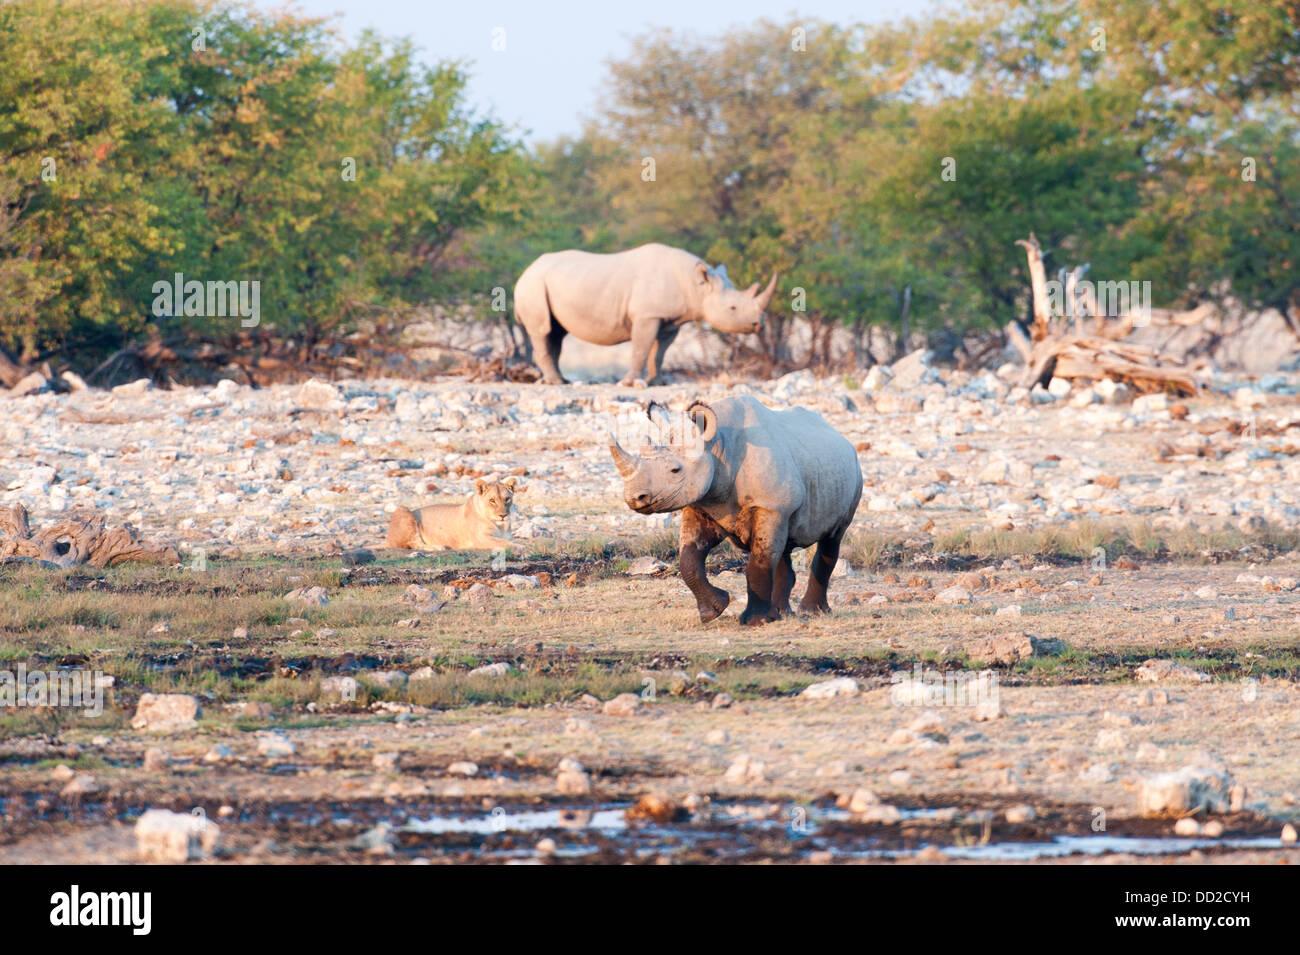 Two Black rhinos (Diceros bicornis) one running and a lioness (Panthera leo) watching,  Etosha Nationalpark, Namibia - Stock Image